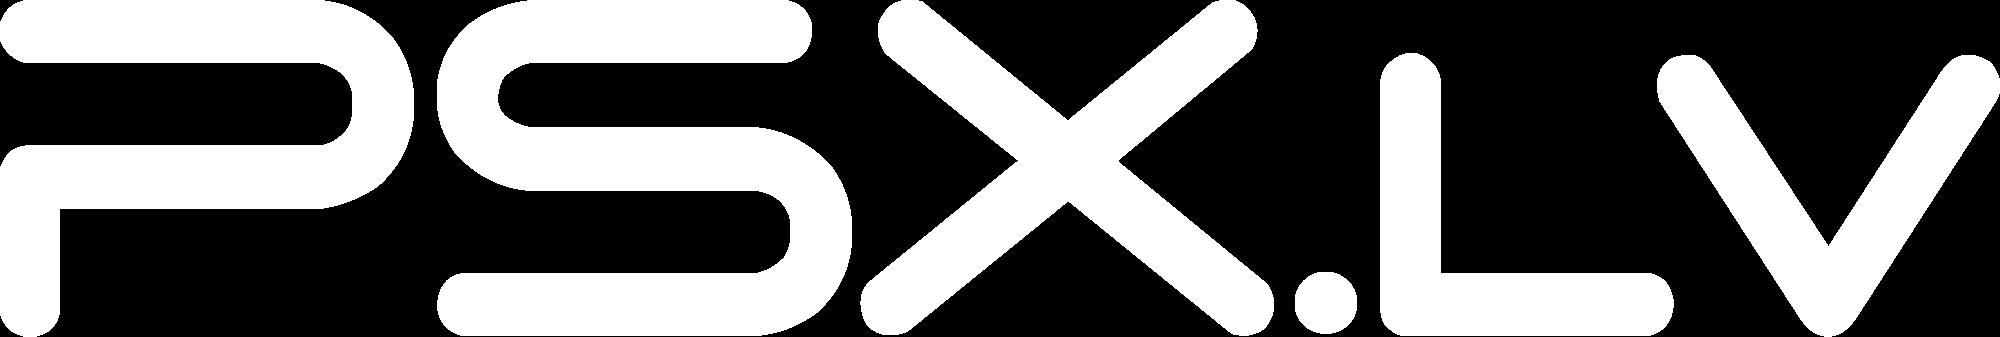 PSX.LV